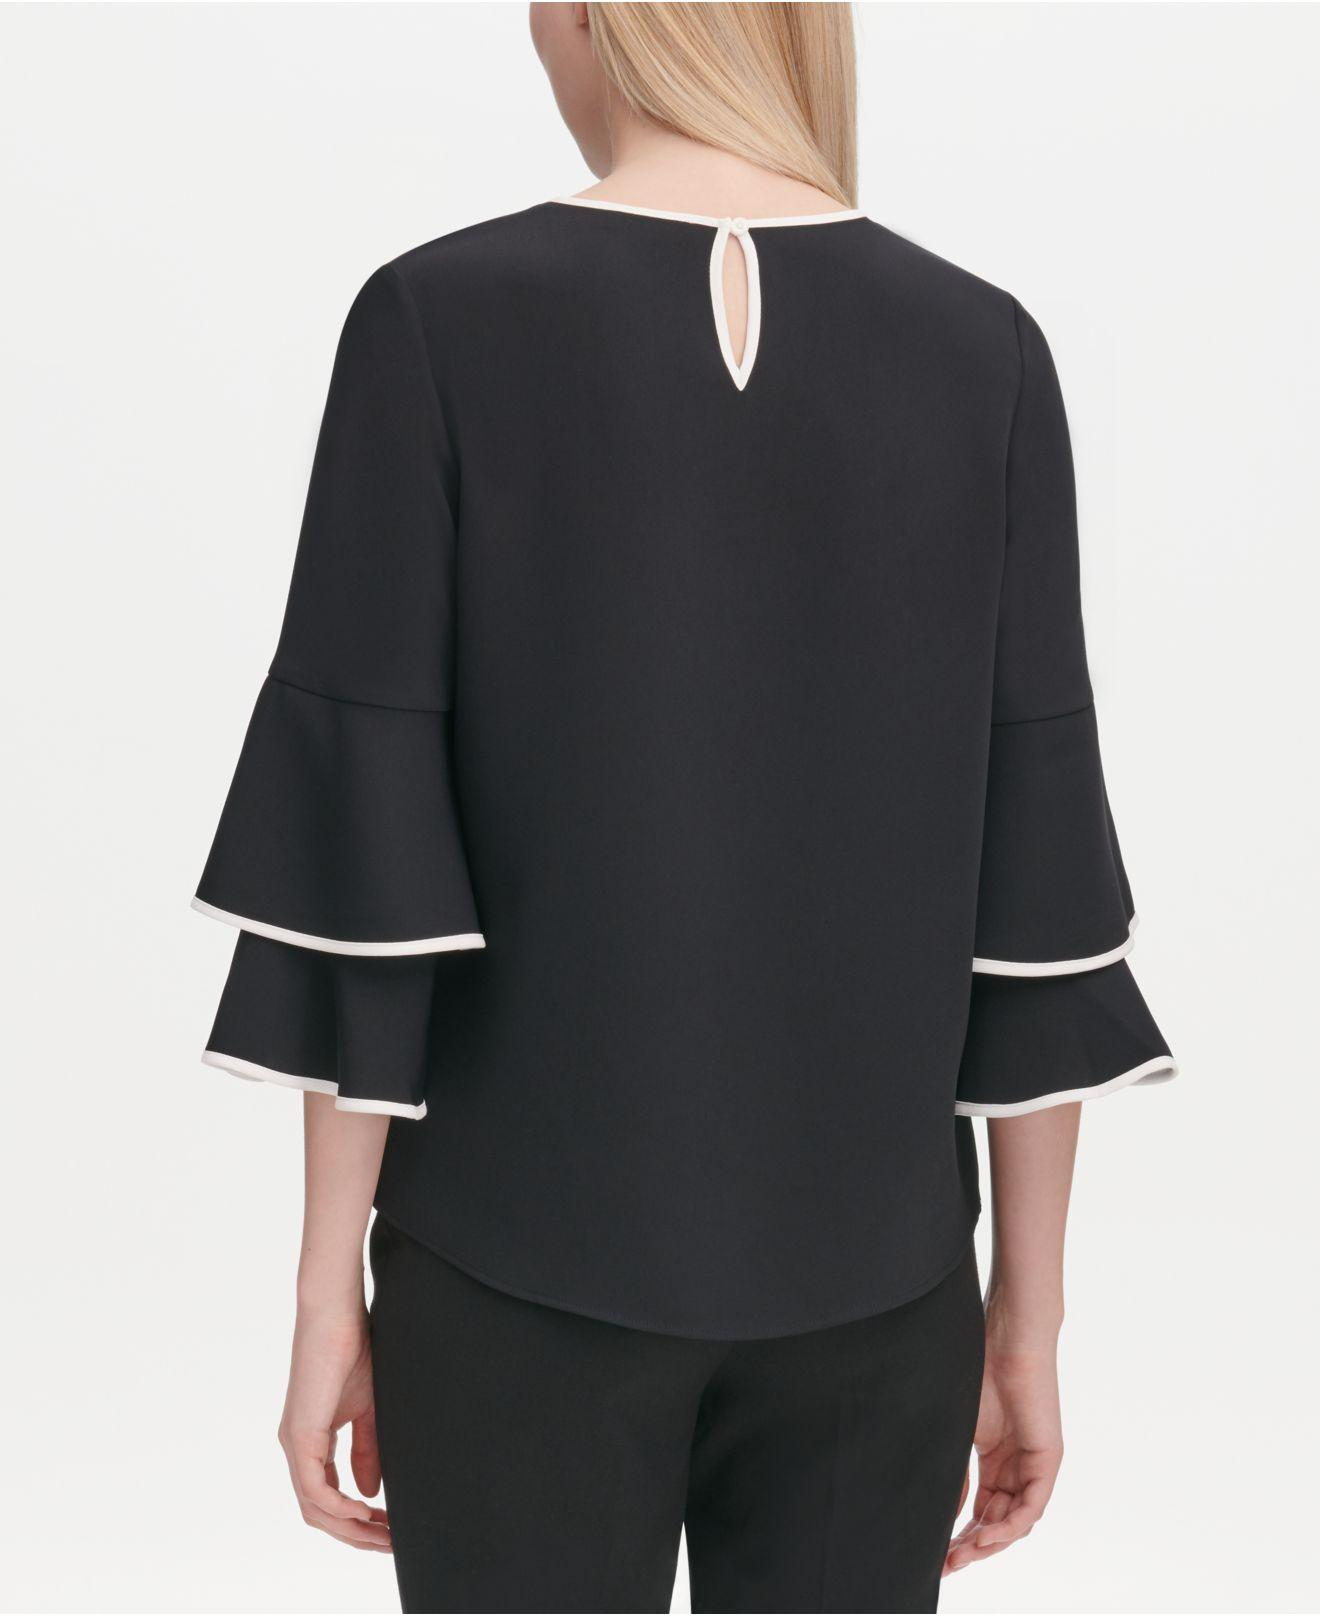 ed70fc366c6489 Lyst - Calvin Klein Contrast-trim Bell-sleeve Blouse in Black